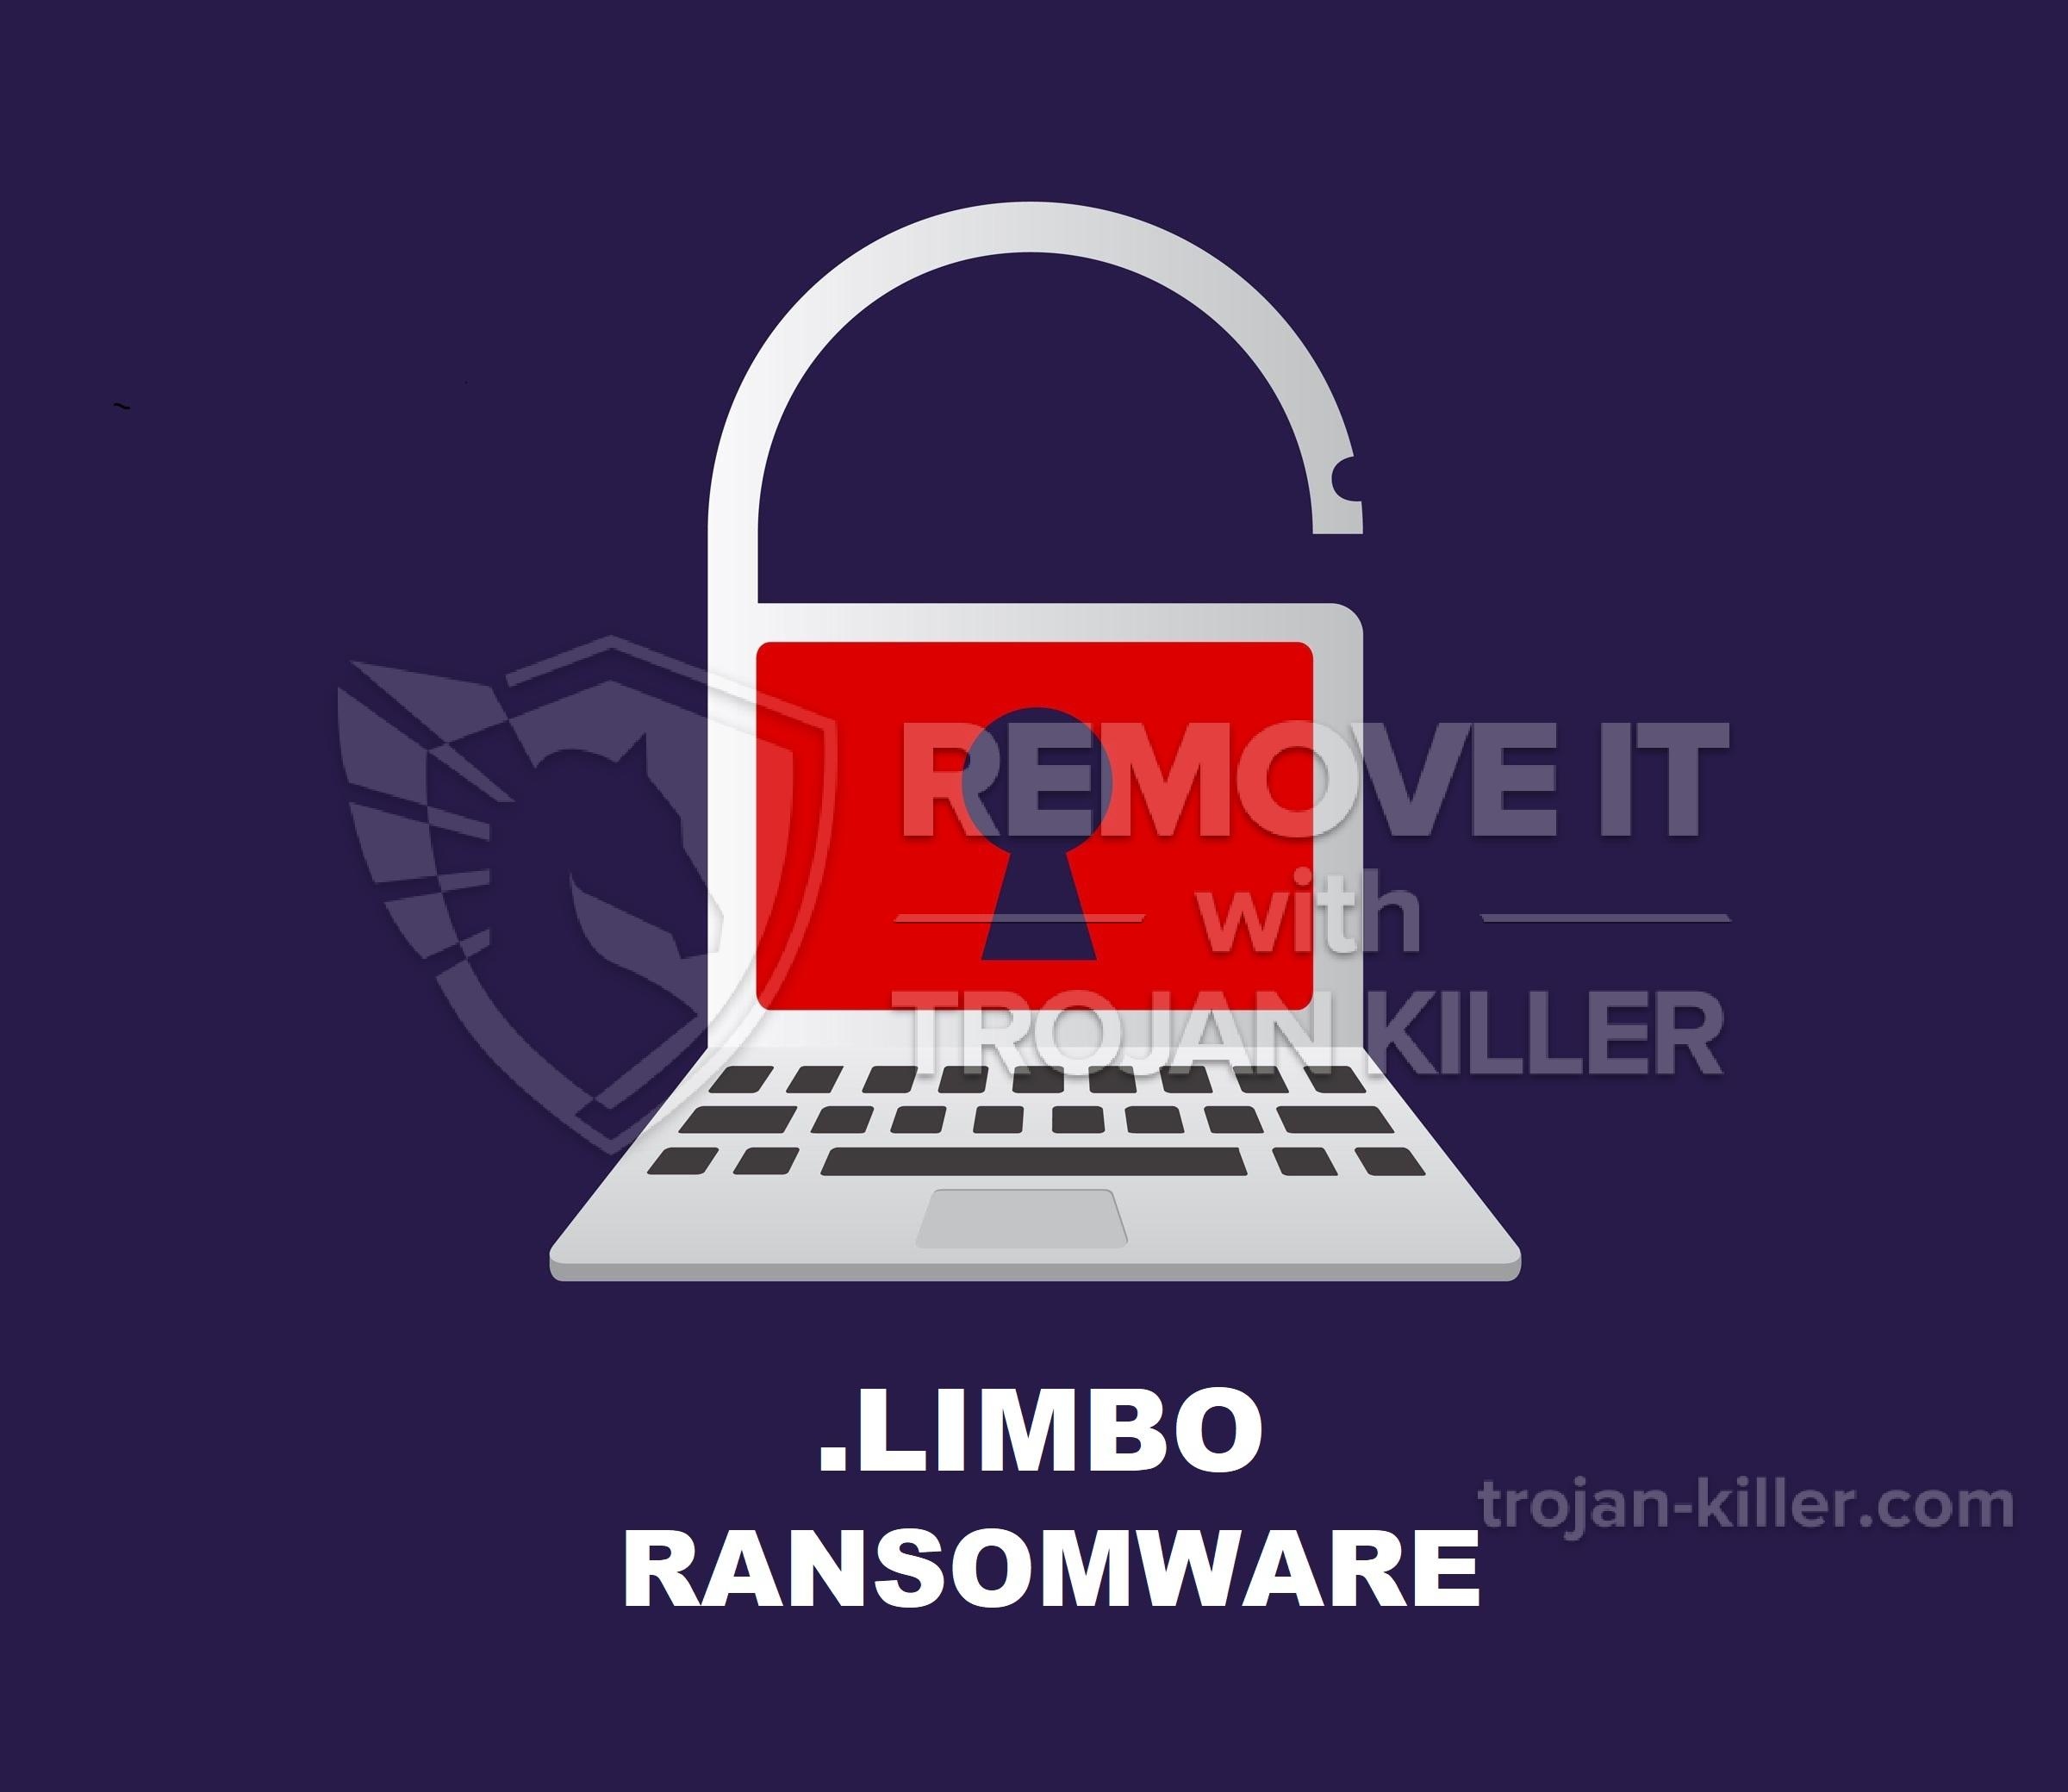 .virus de LIMBO